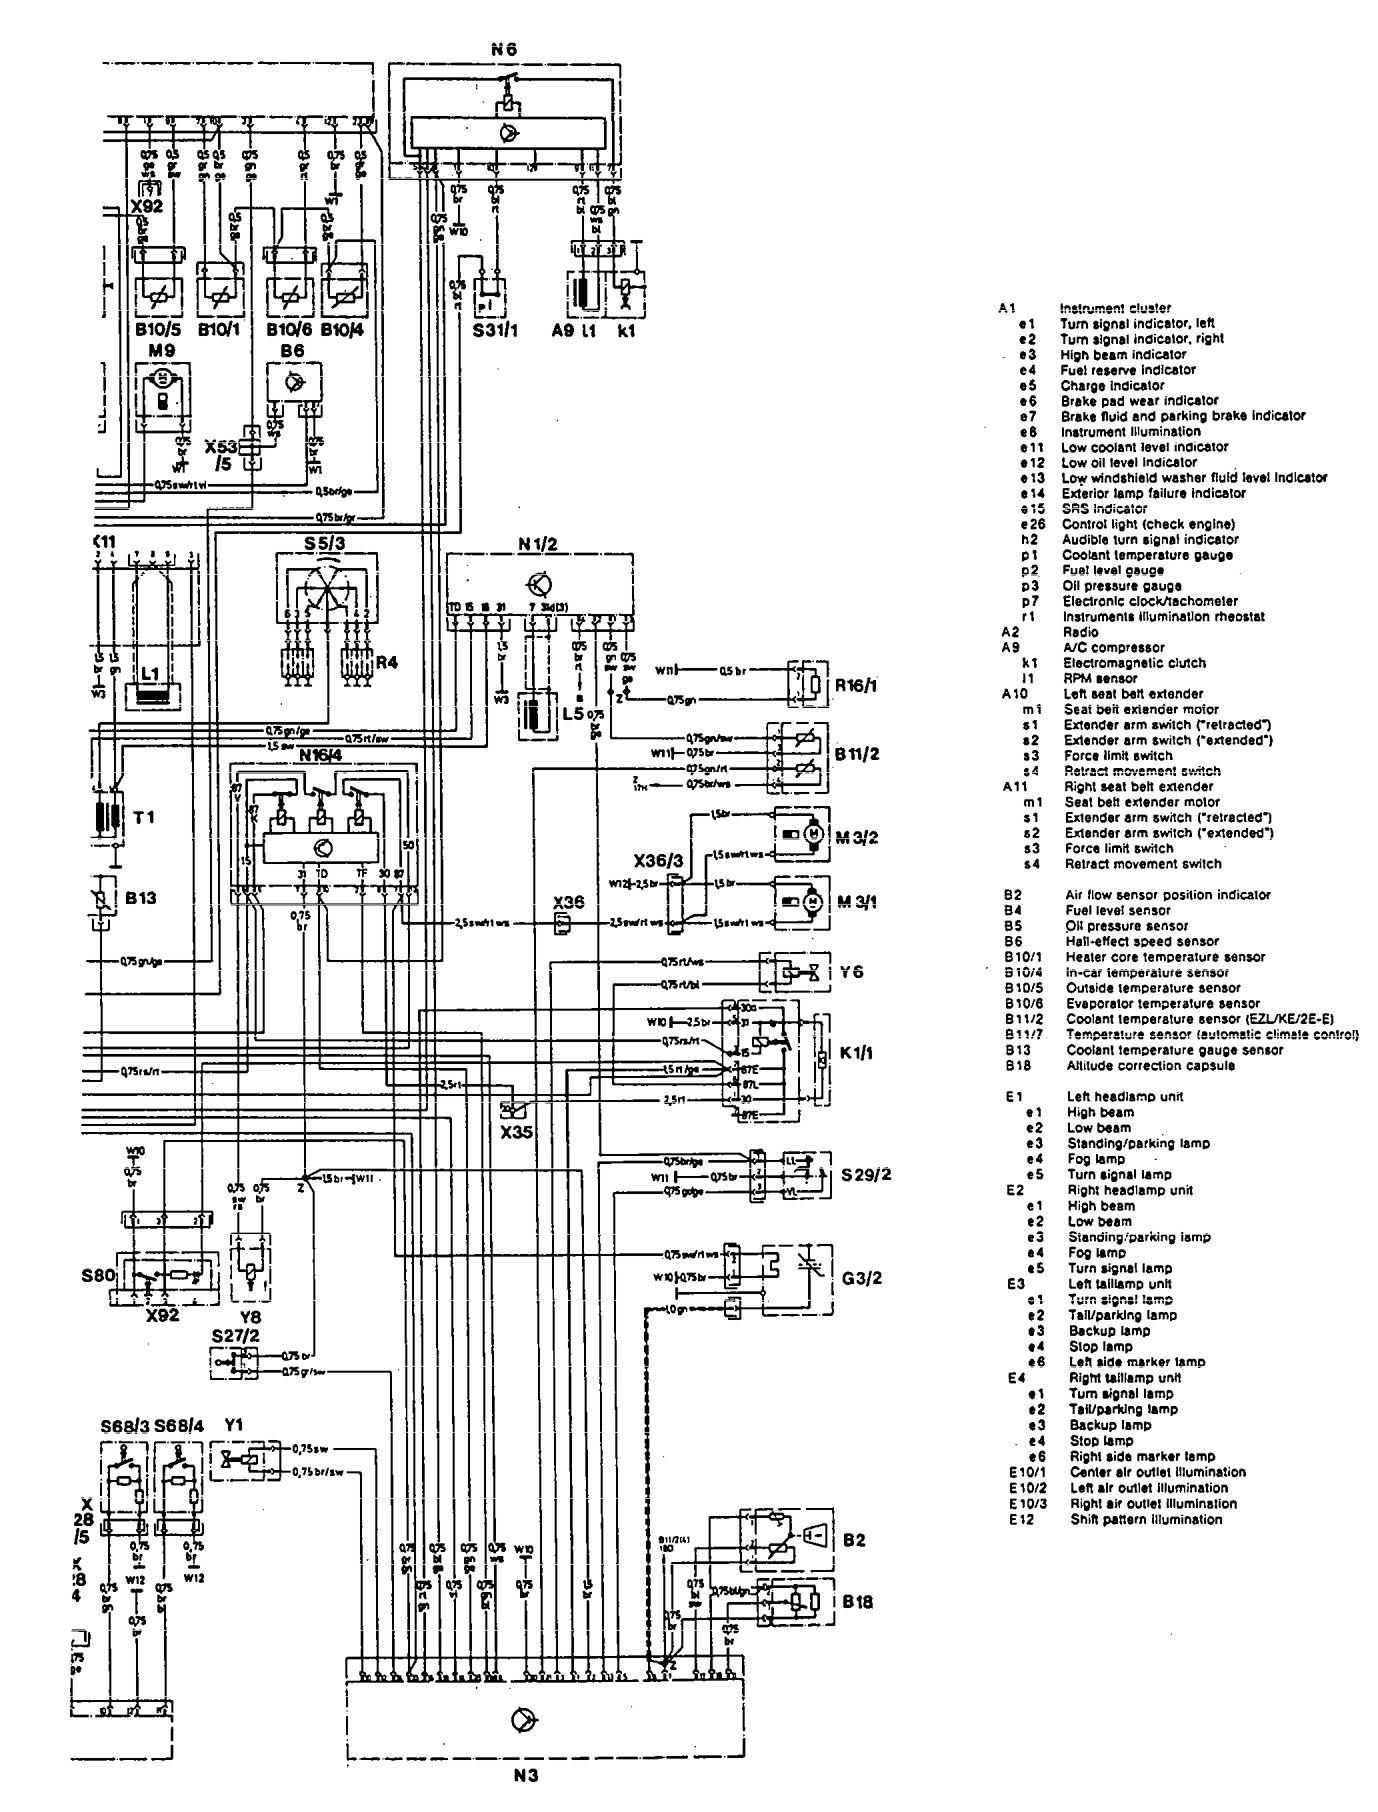 mercedes-benz 300ce  1992 - 1993